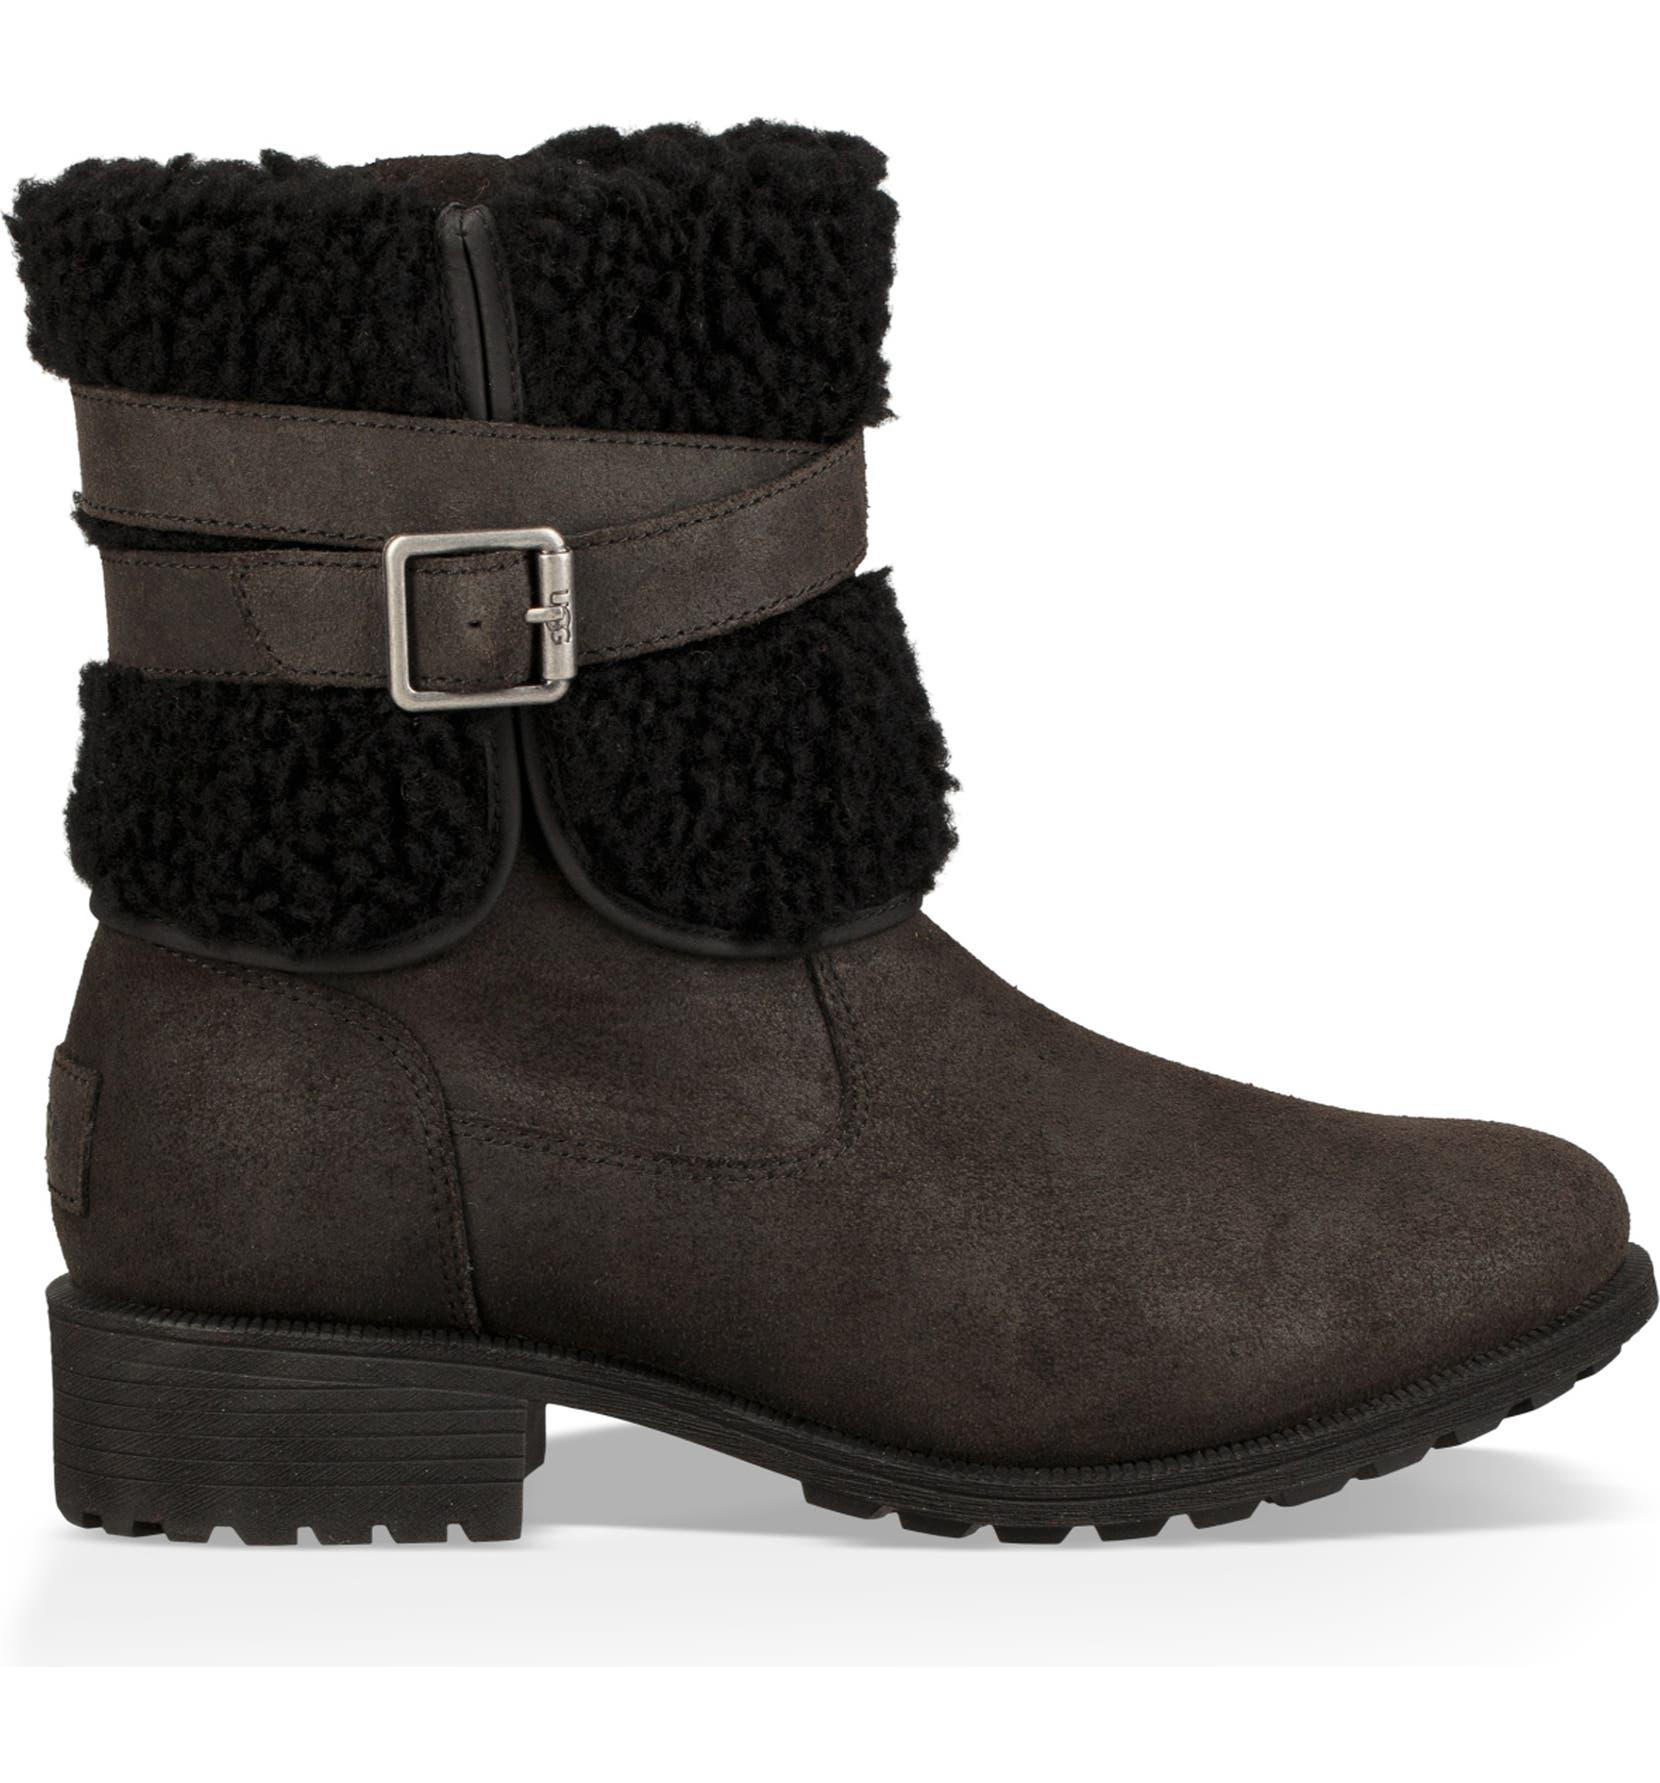 f600bcfe773 Blayre III Wool Cuff Bootie